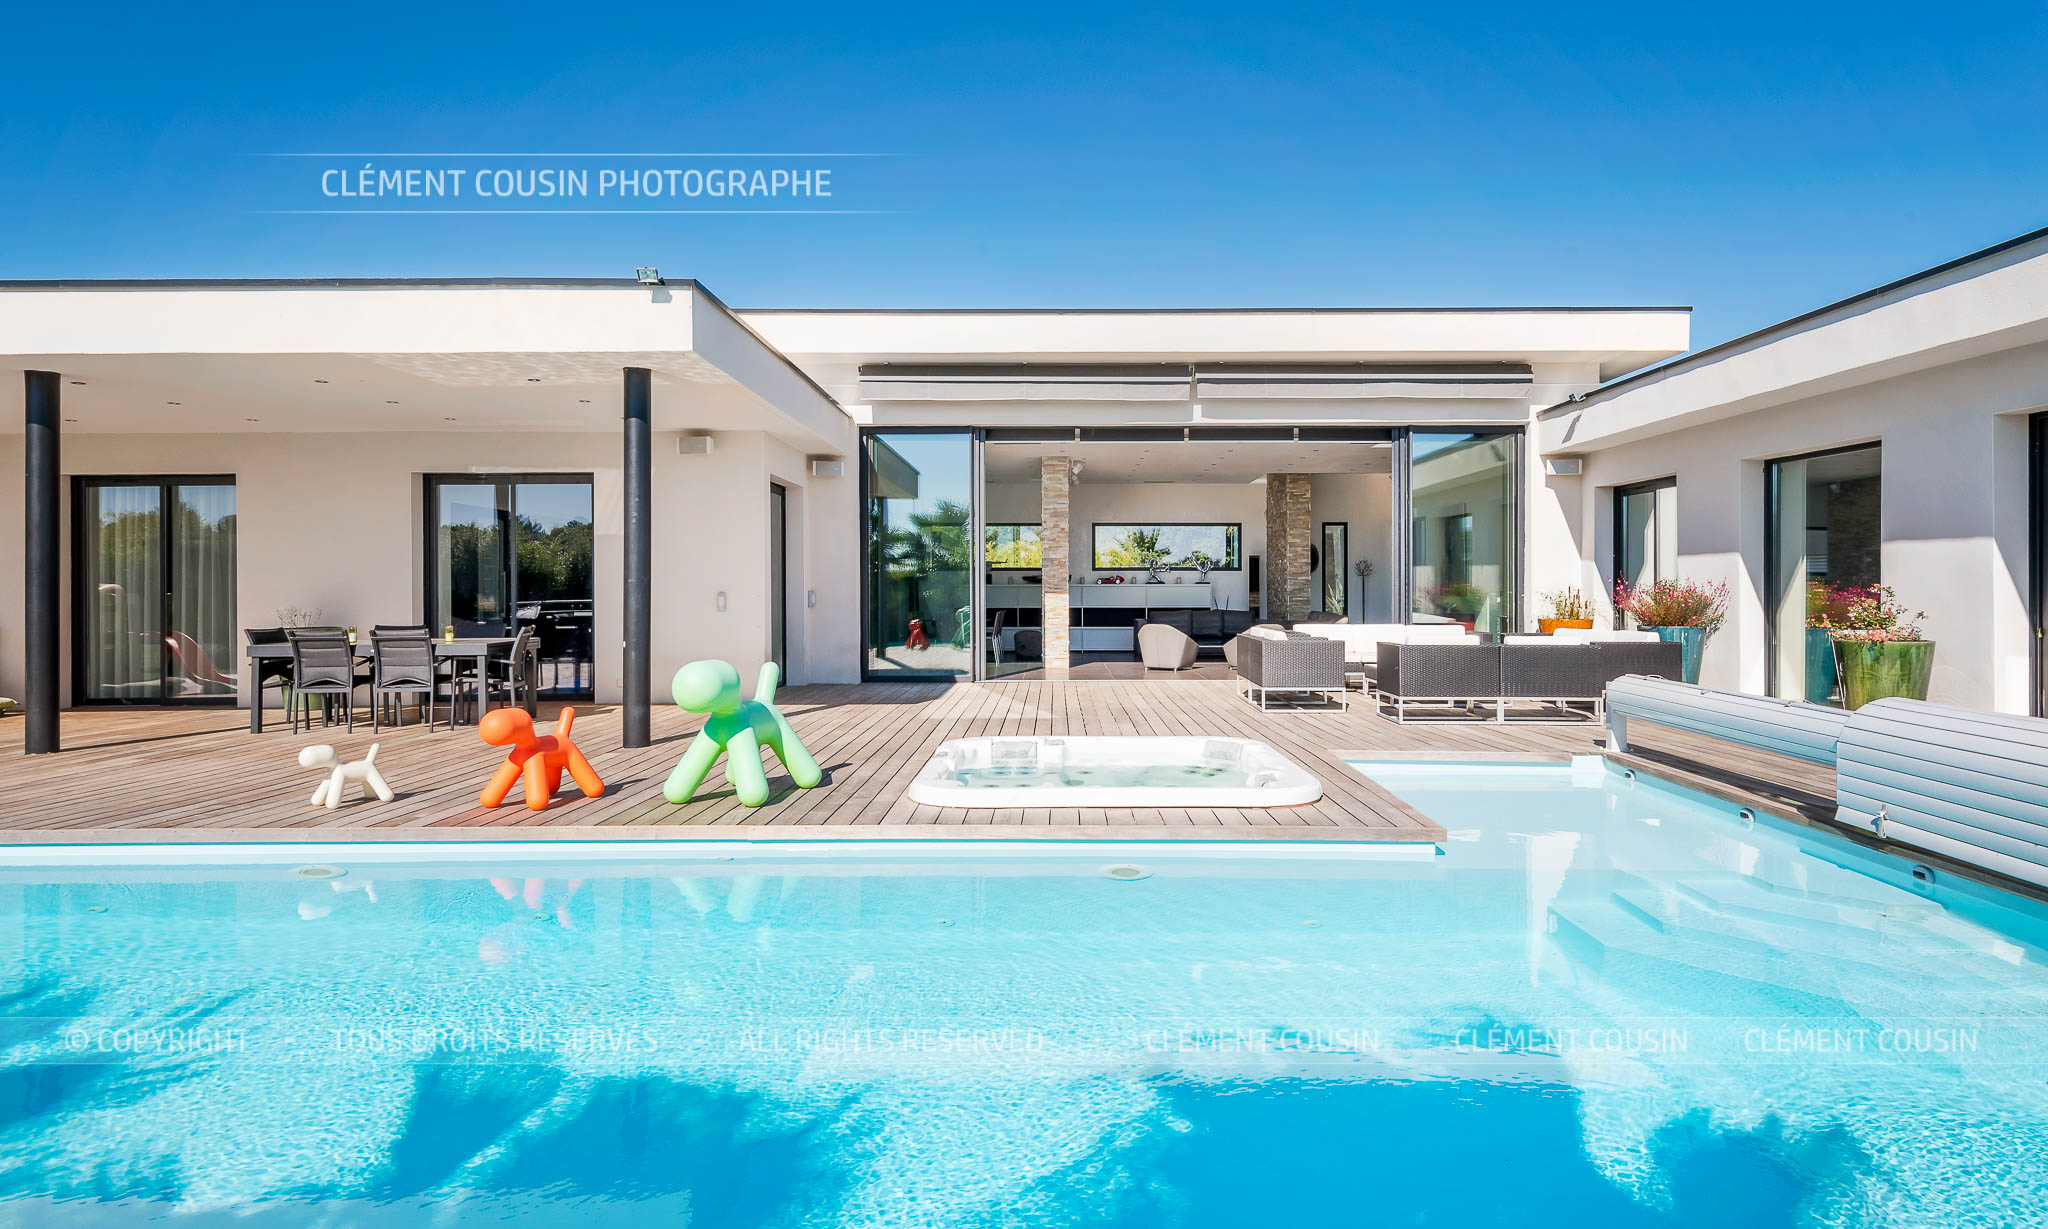 Sothebys-villa nimes-moderne-piscine-6.jpg